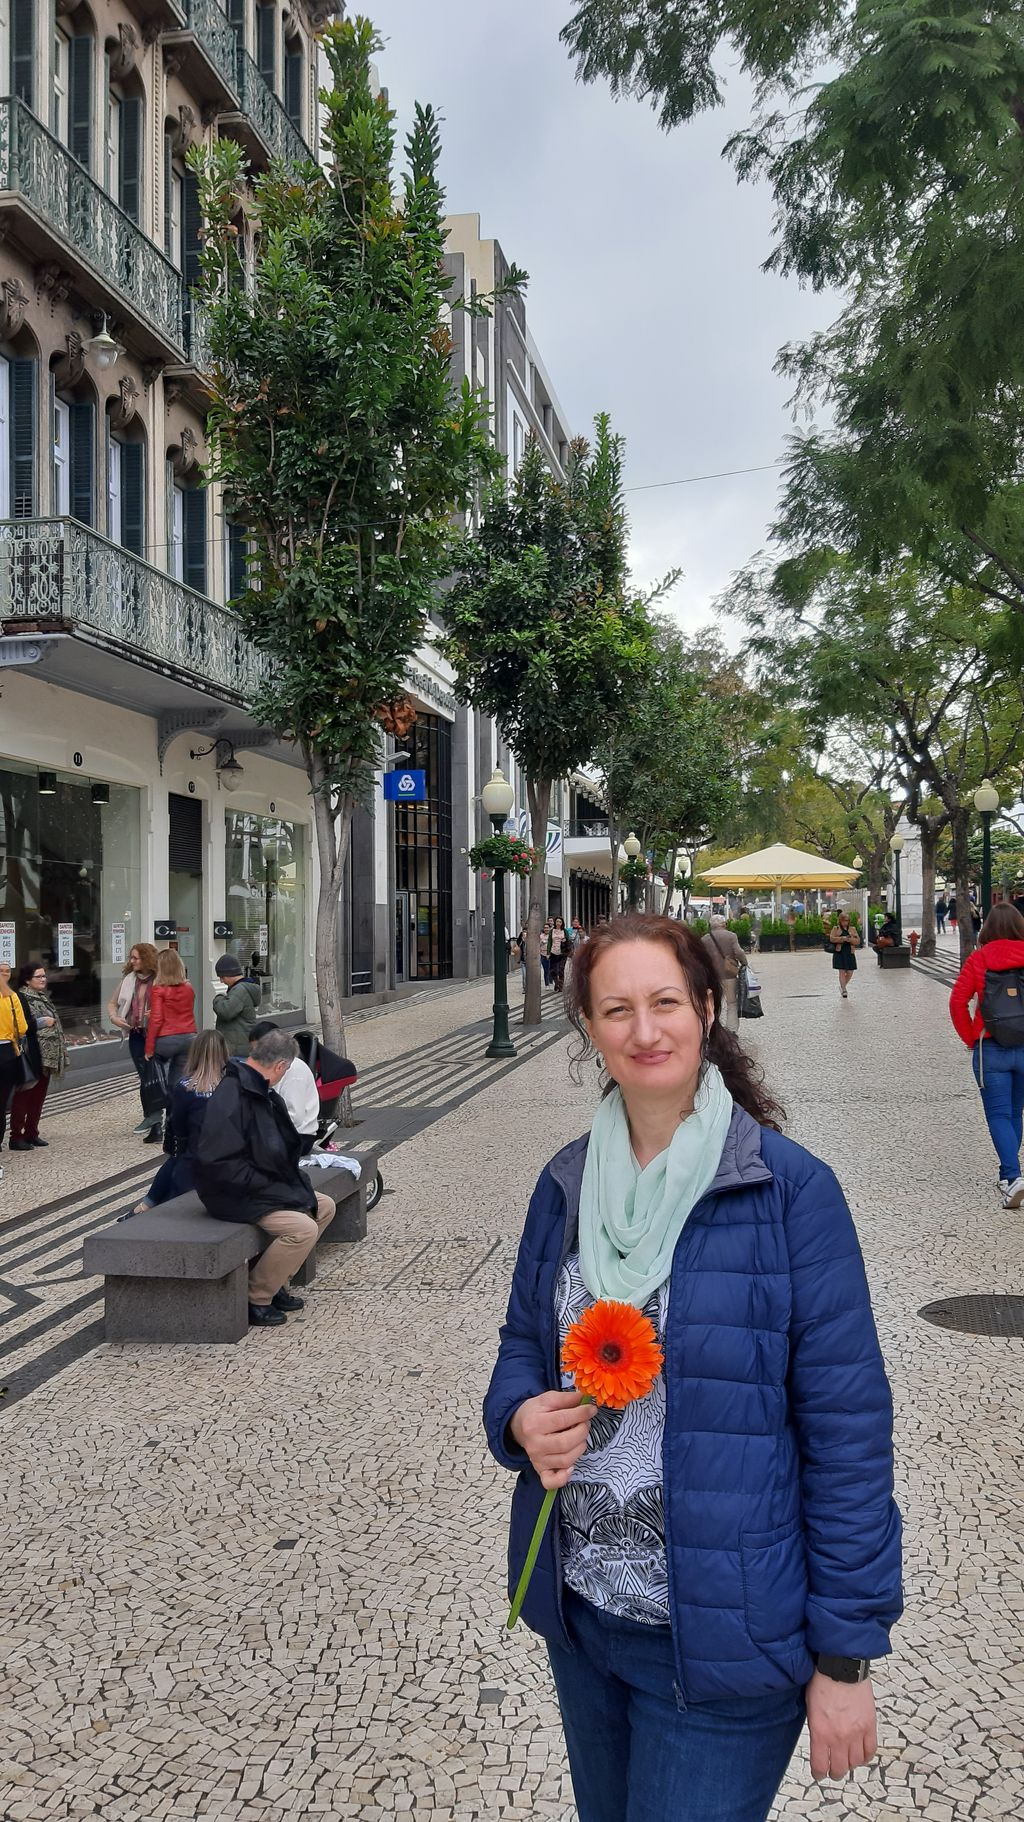 Náměstí Funchal, Lenka